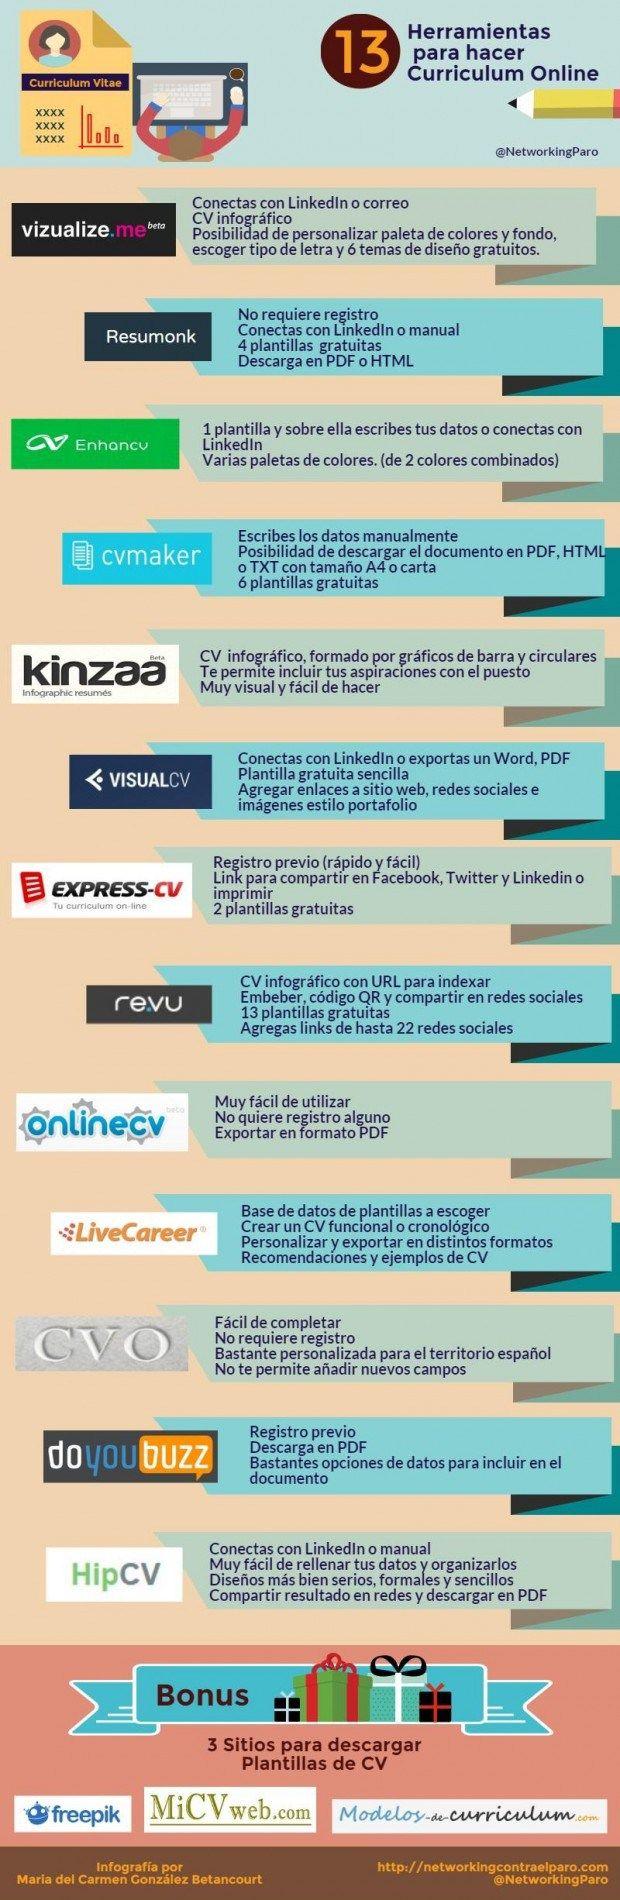 13 herramientas para crear Curriculum Online #infografia #infographic #empleo  Ideas Desarrollo Personal para www.masymejor.com